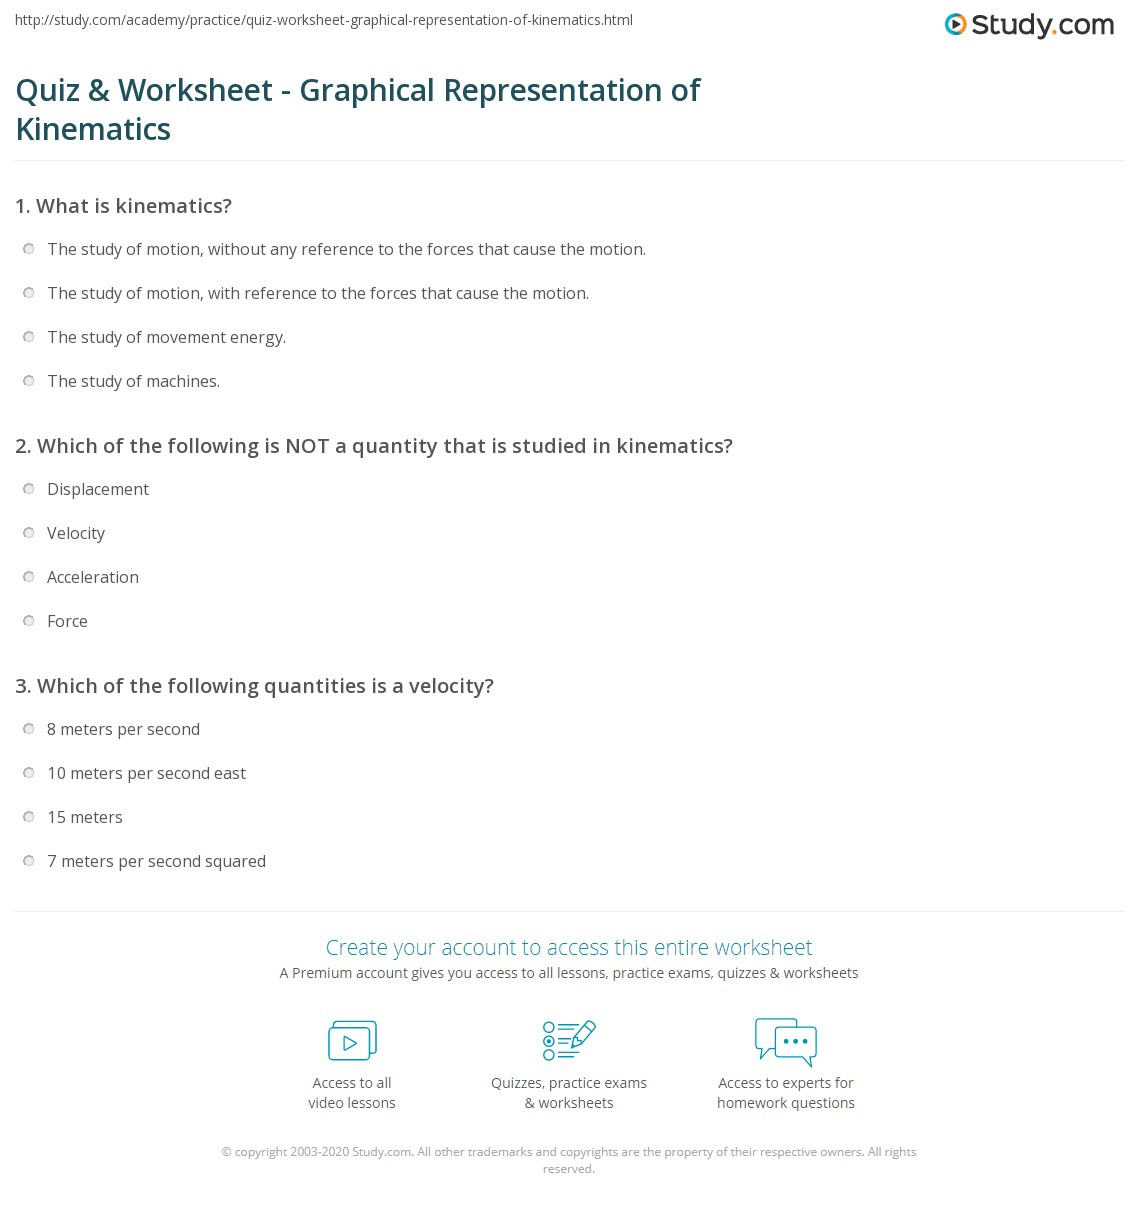 Quiz Worksheet Graphical Representation Of Kinematics Study